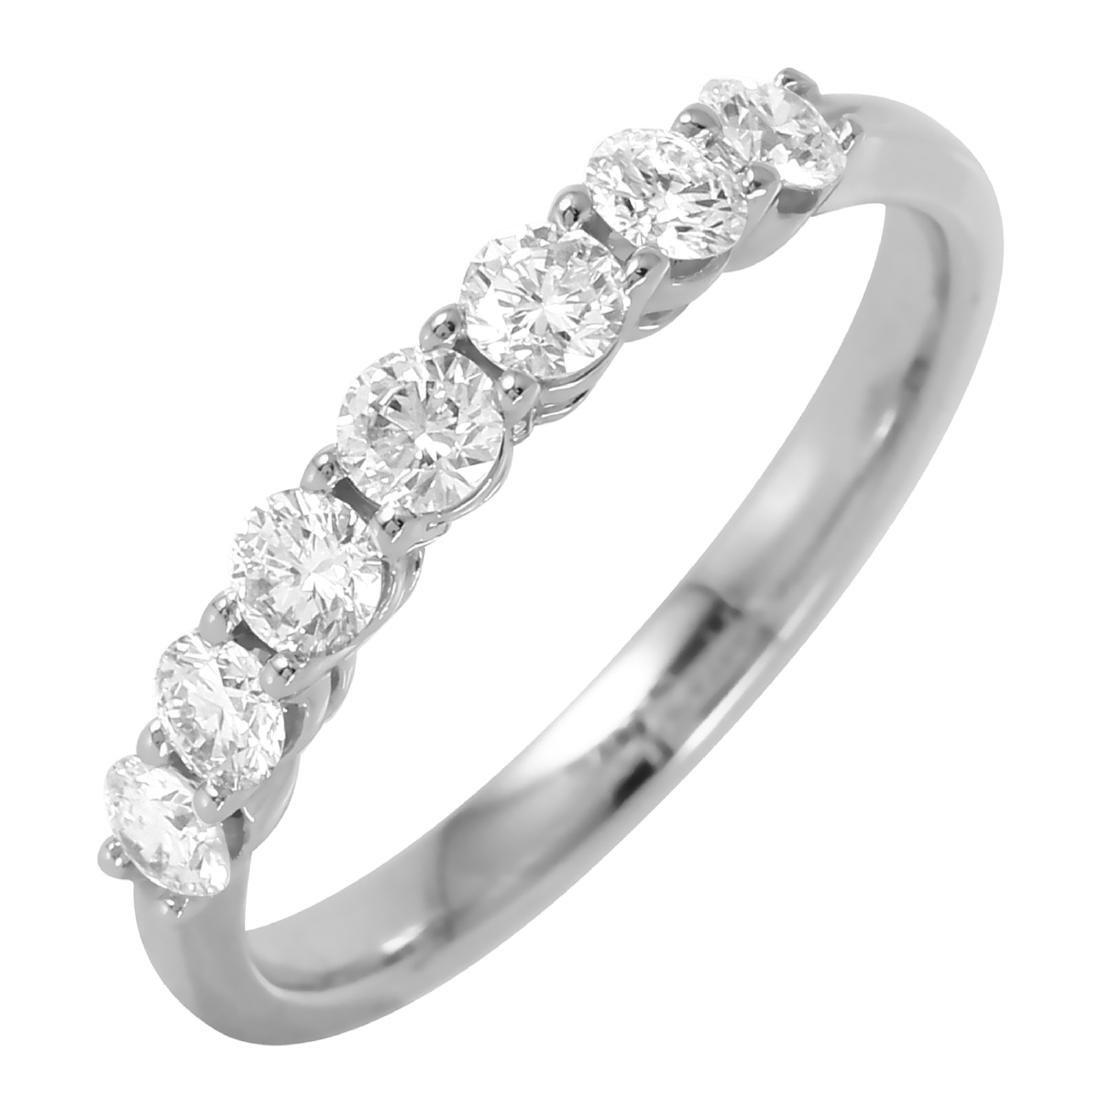 14KT White Gold 0.7ctw Diamond Wedding Band Ring Size